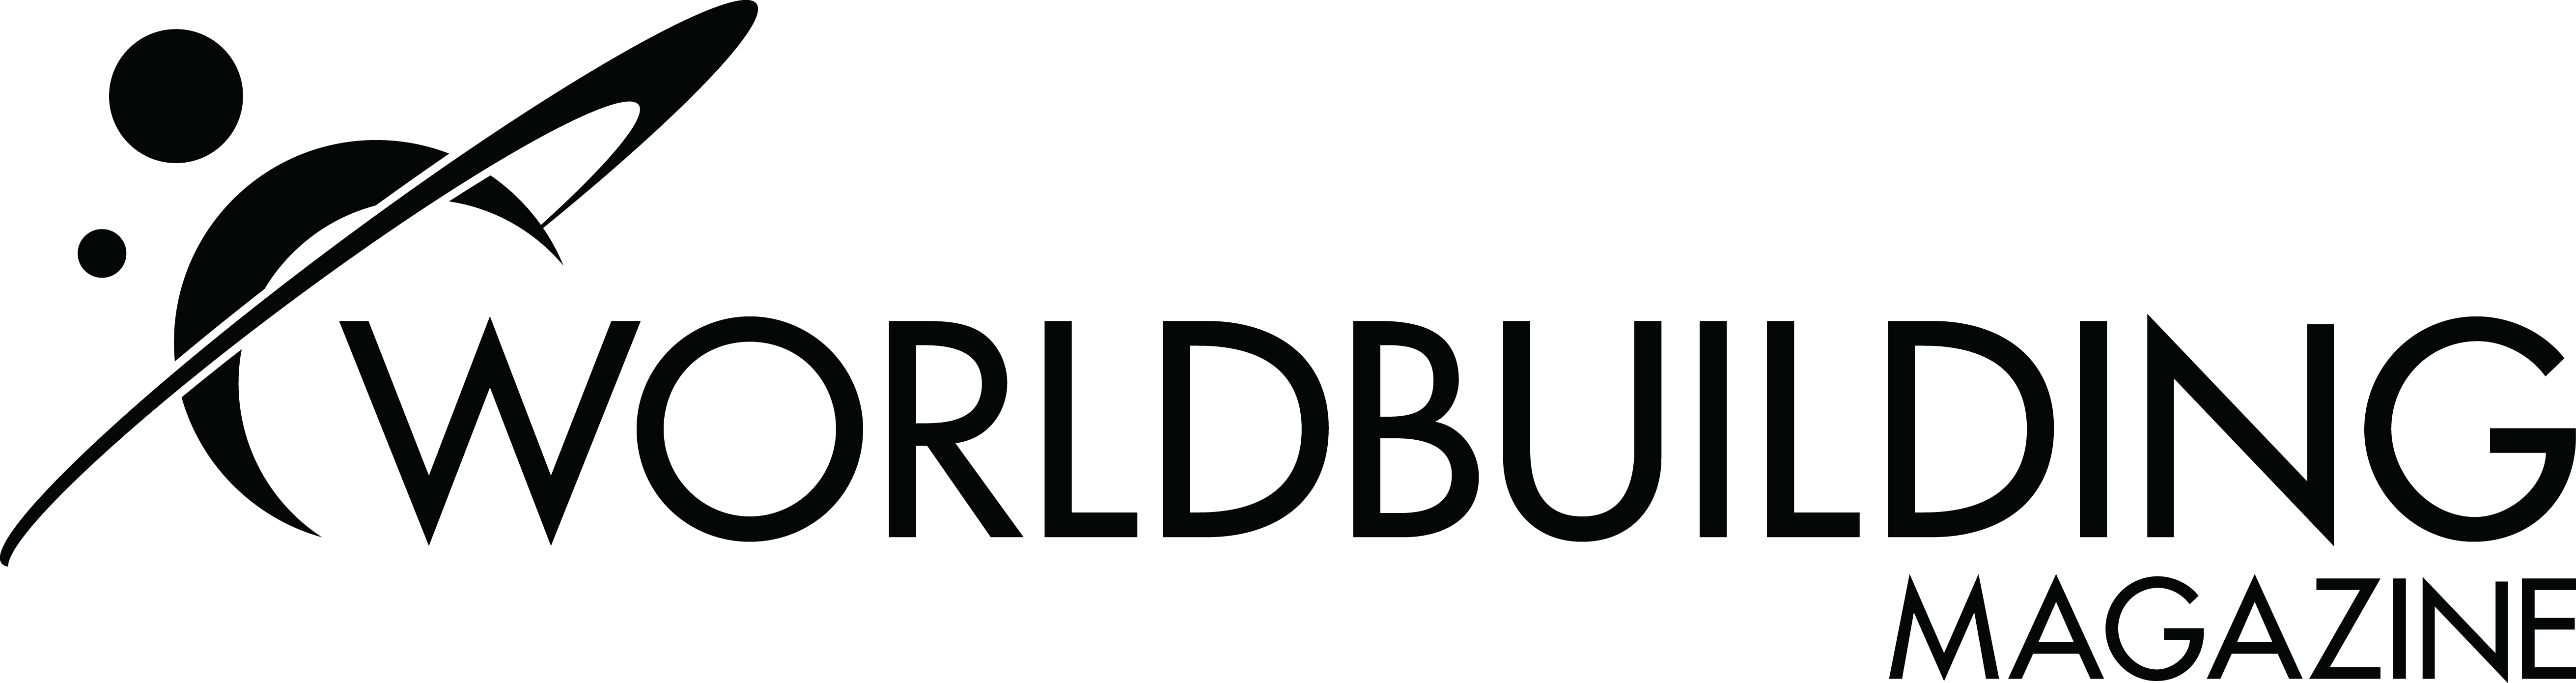 Worldbuilding Magazine